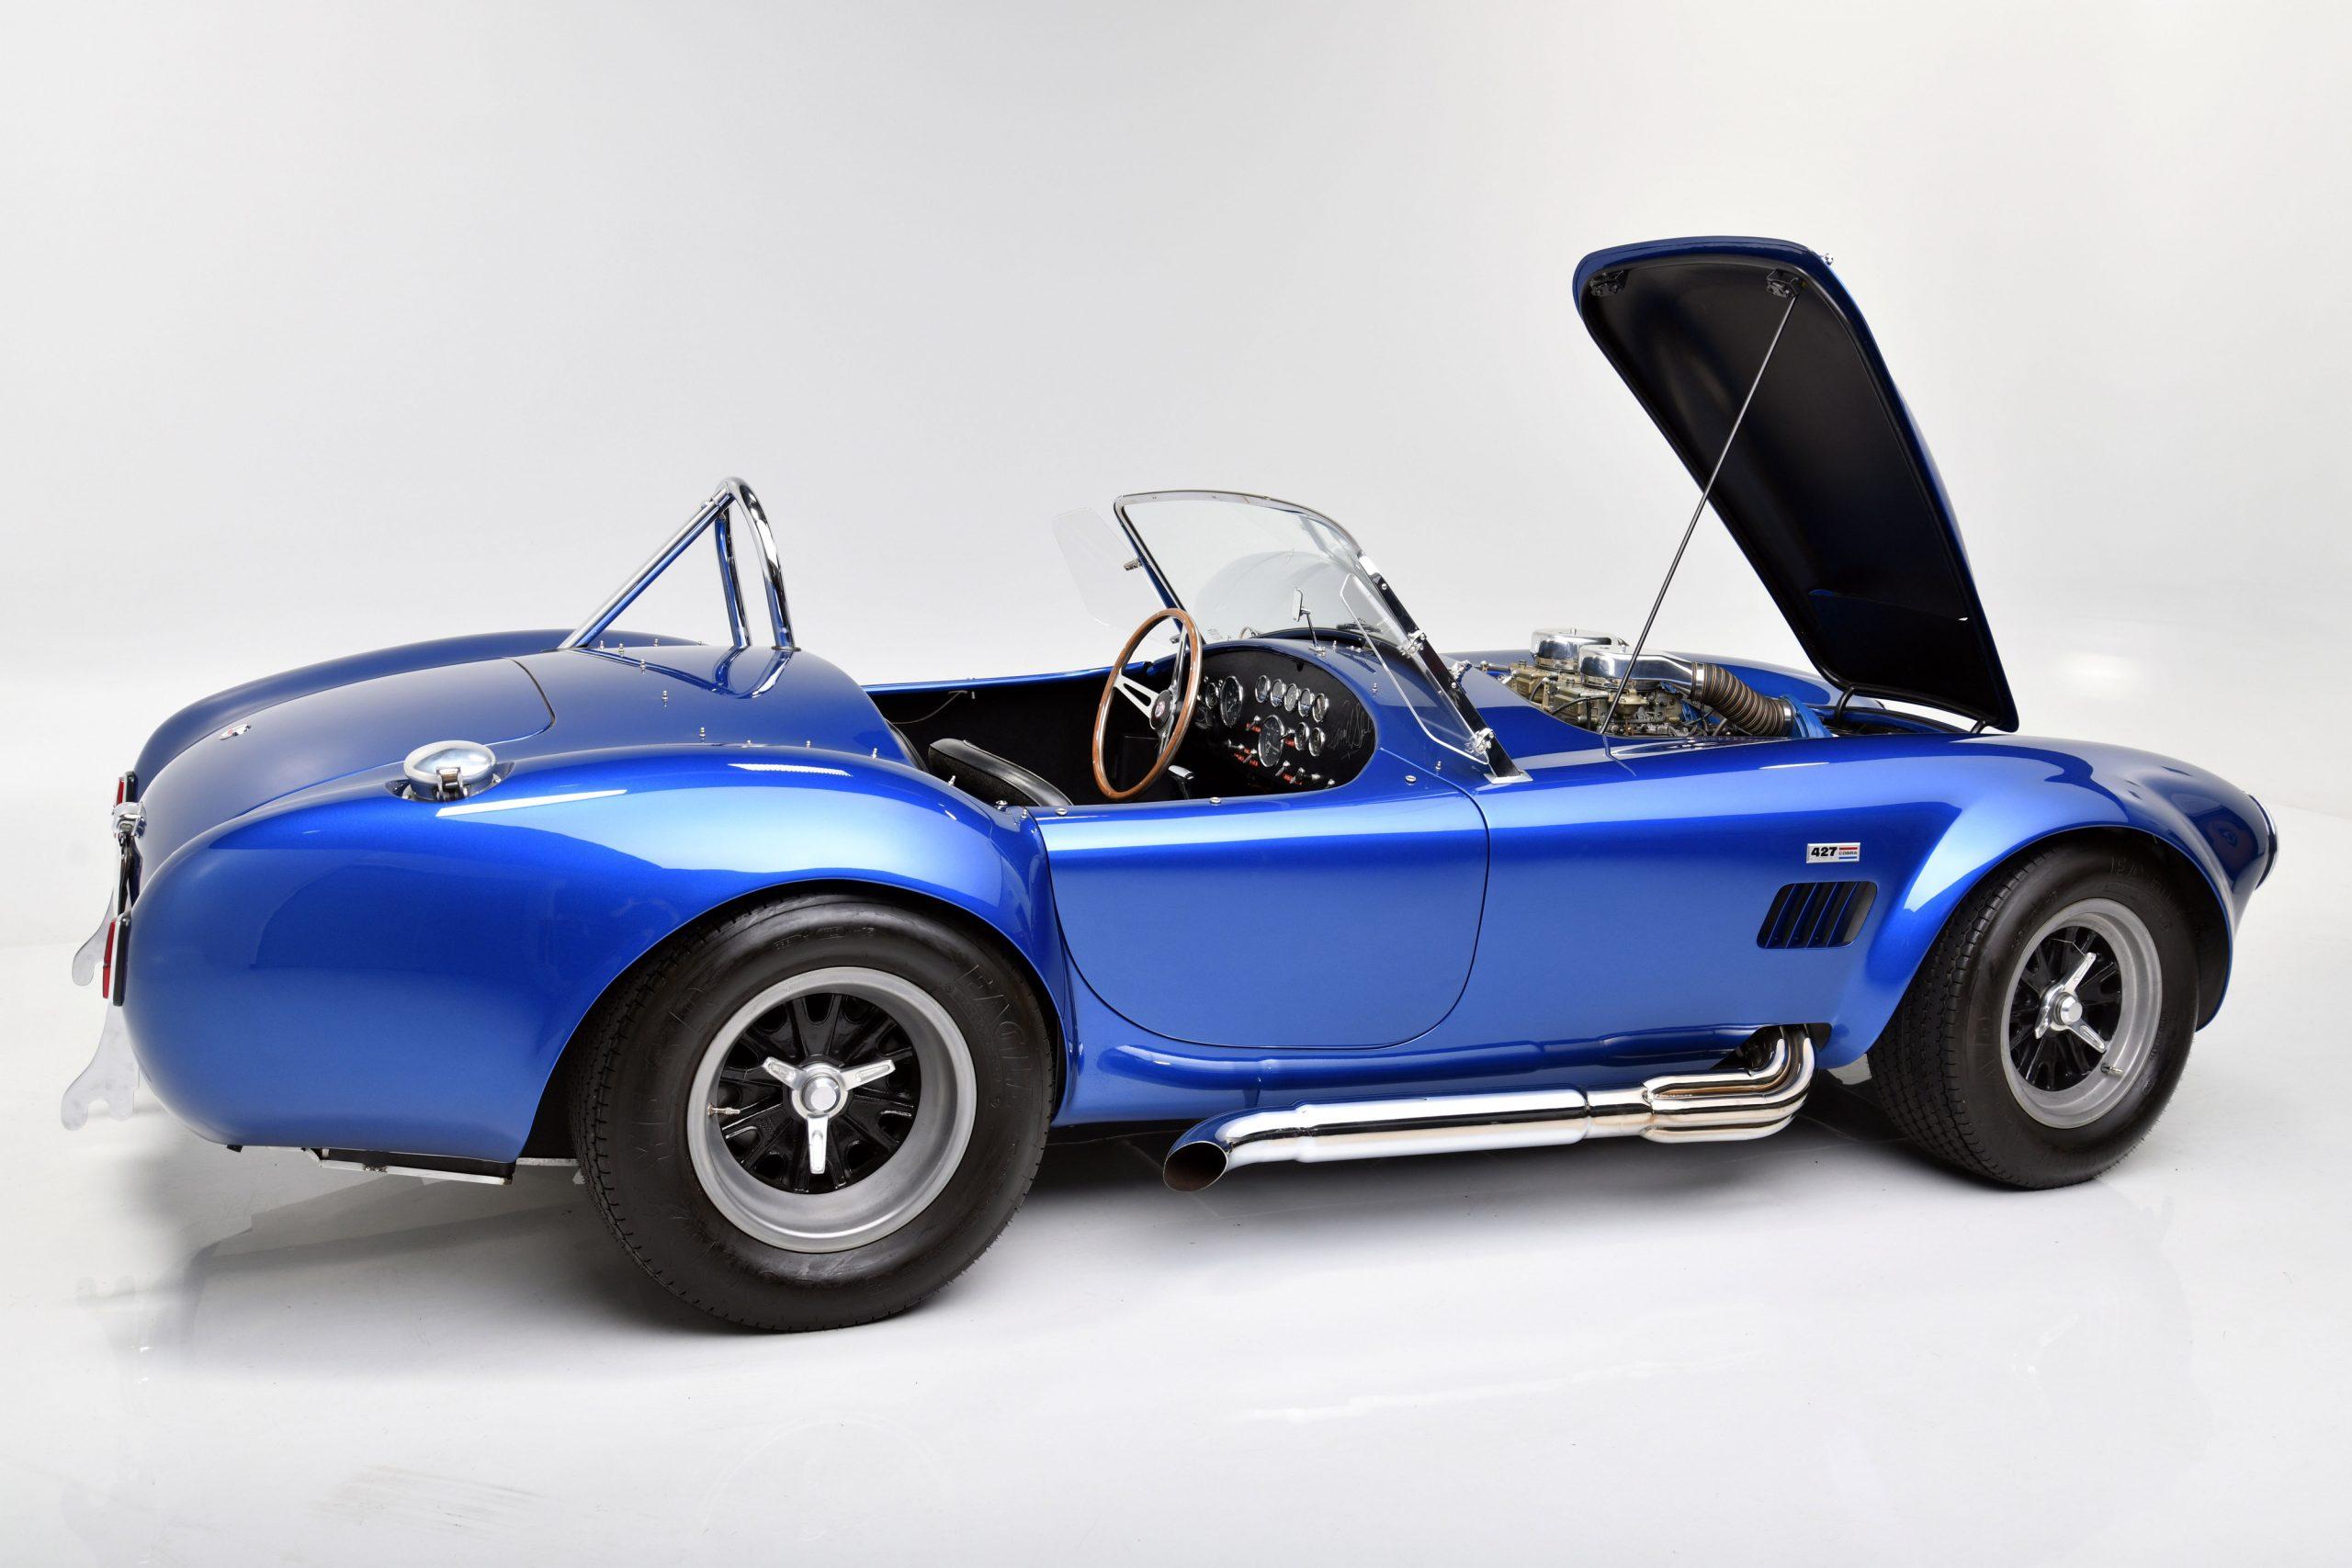 CSX 3015 Shelby Cobra side profile